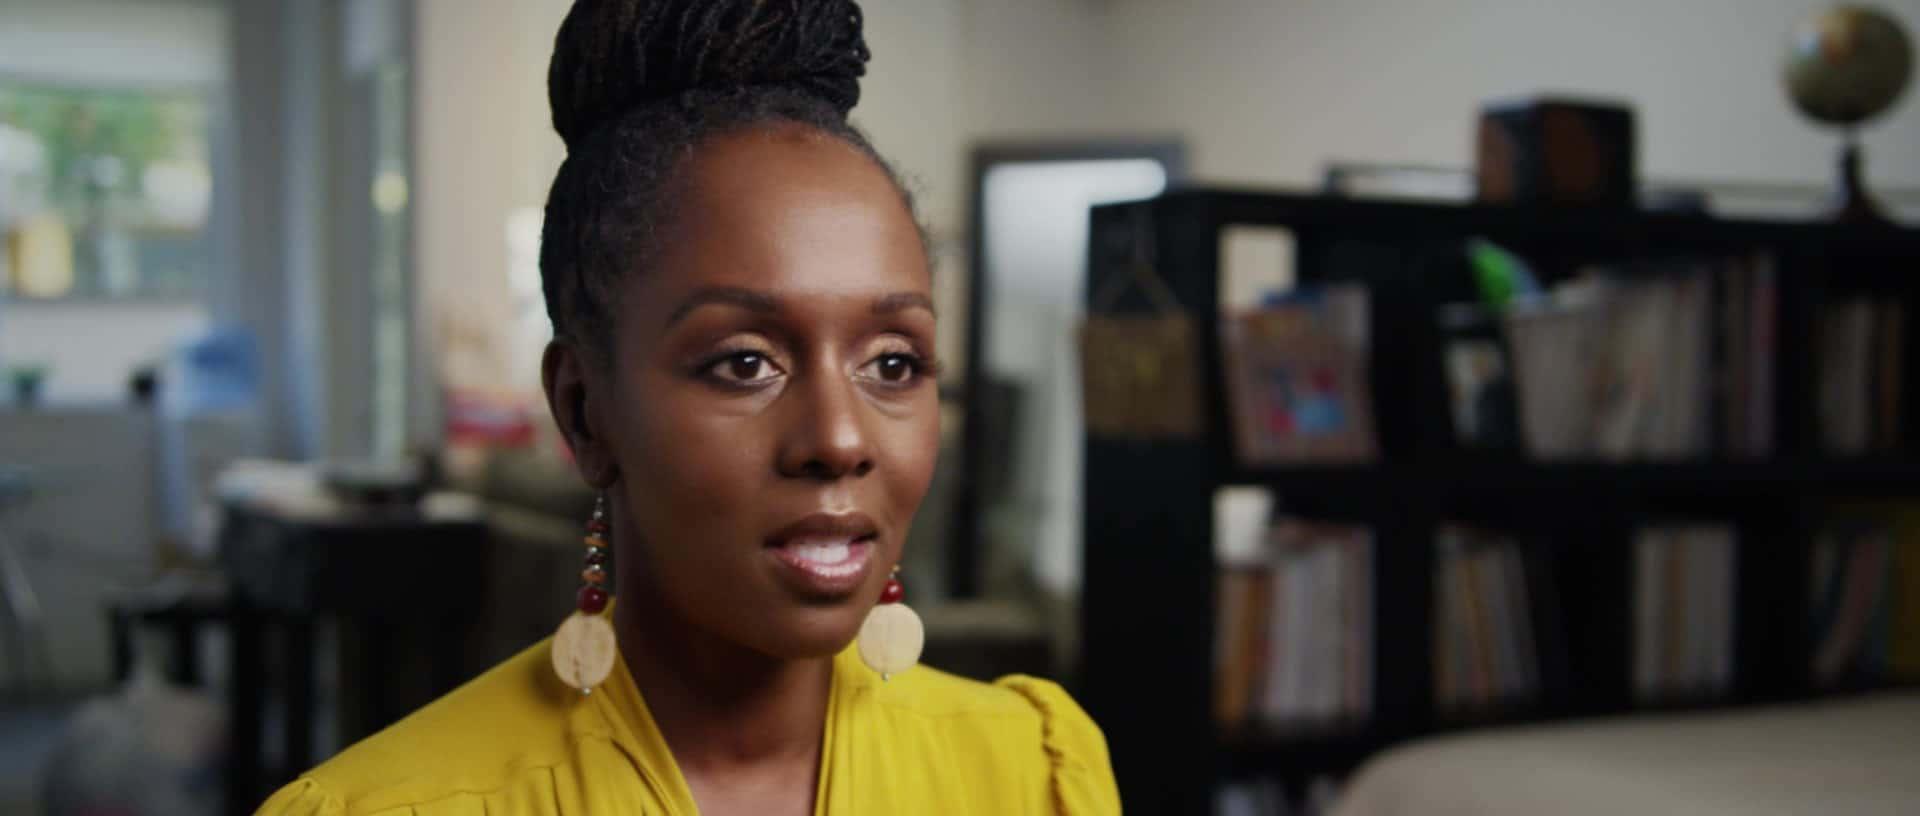 A Fashion Journalism Story: Stephanie Thomas